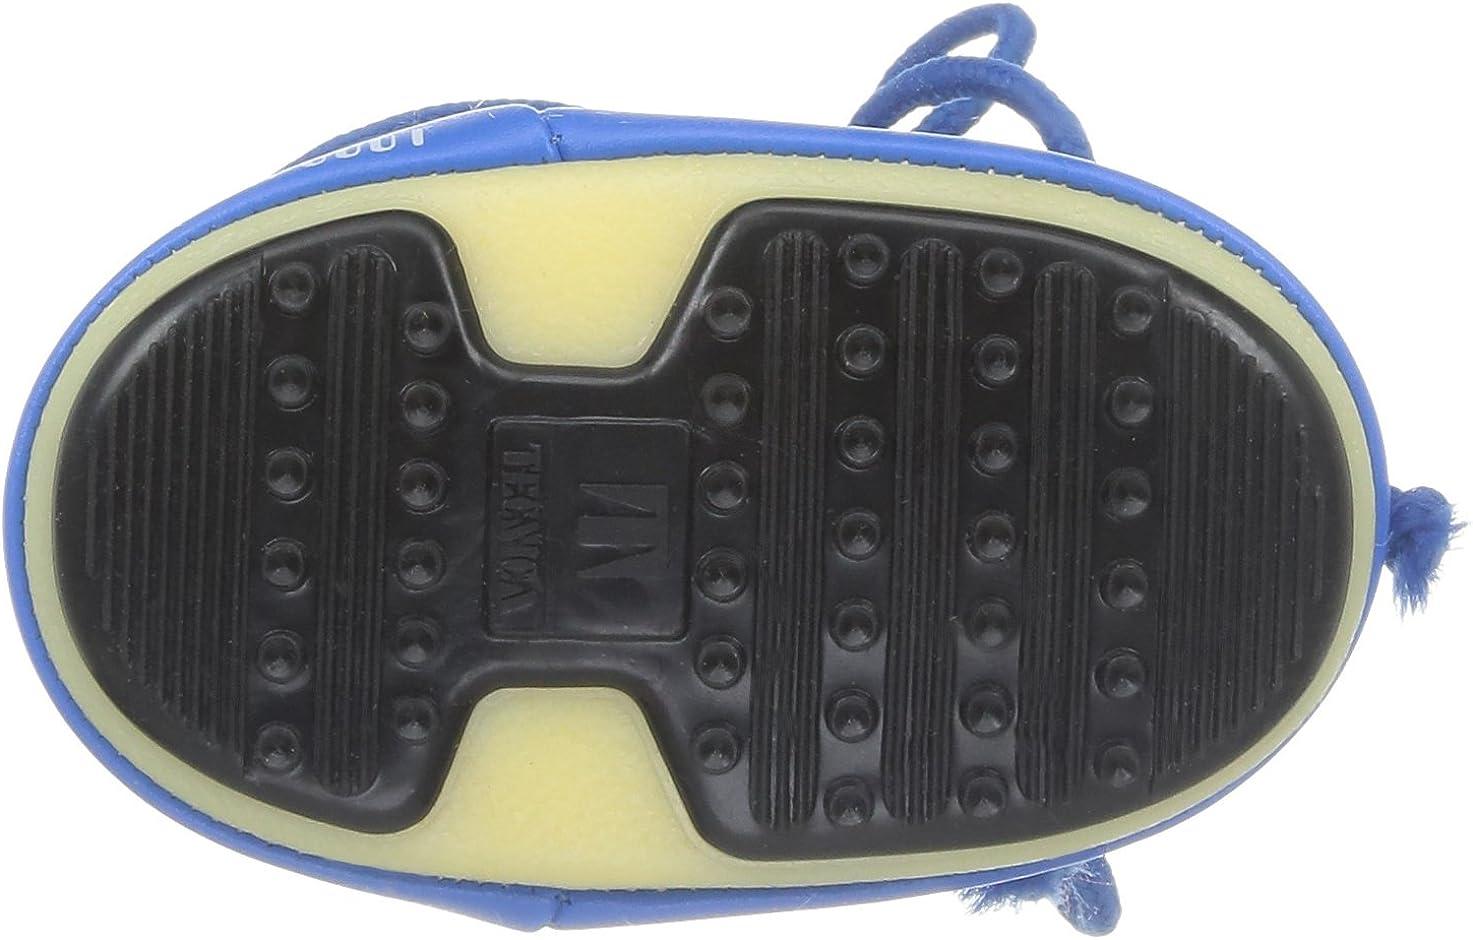 Moon Boot Mini Nylon 22 EU Azzurro Chaussures b/éb/é mixte enfant Bleu